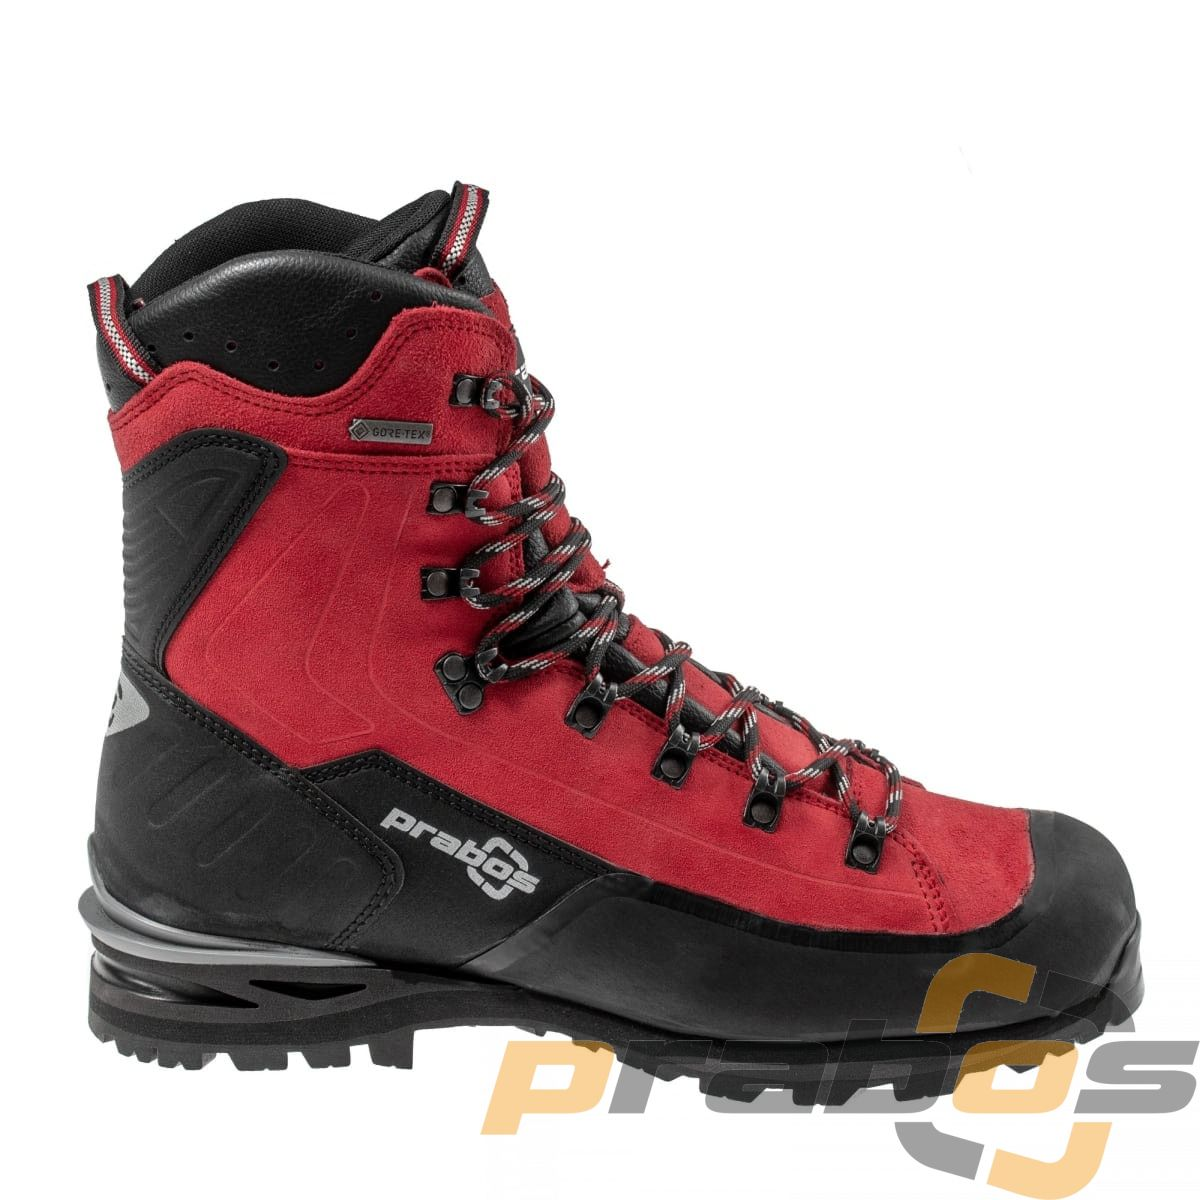 Wysokie buty górskie pod raki z membraną Gore-Tex i Vibram